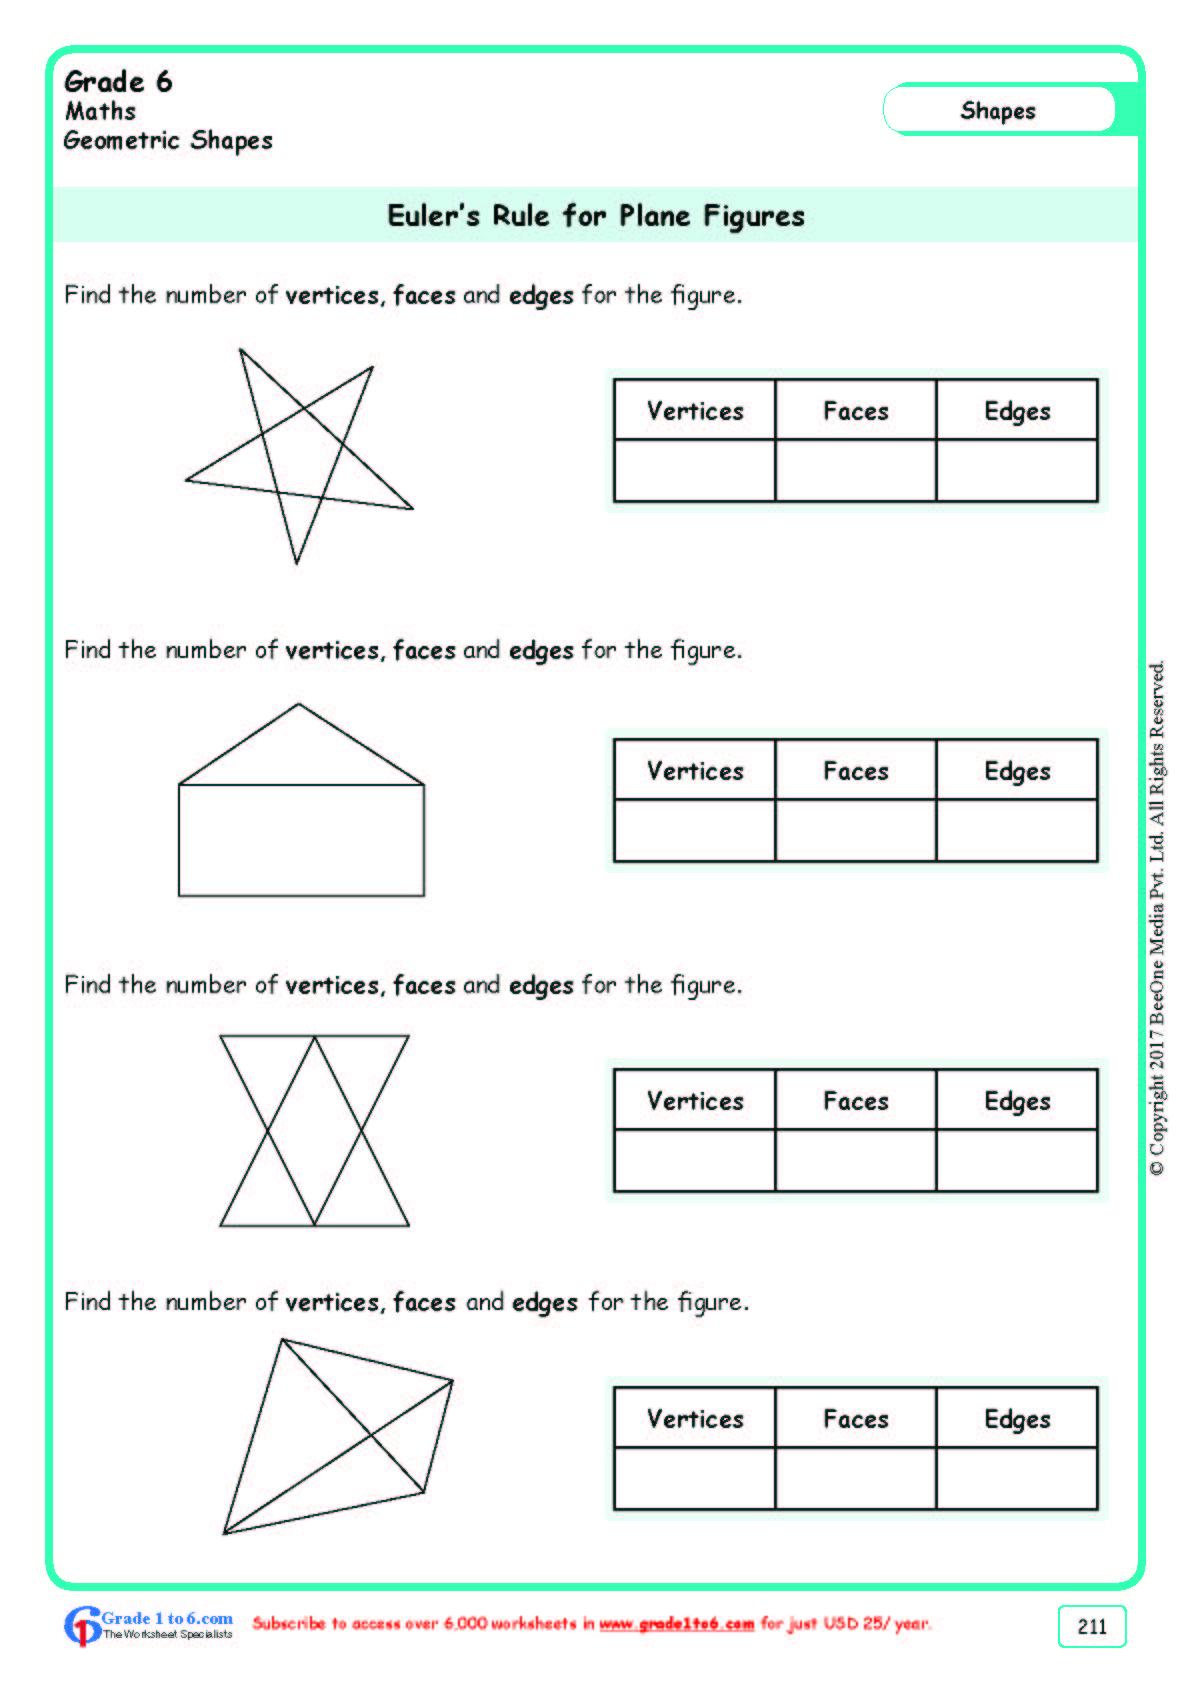 hight resolution of Grade 6 Class Six Euler's Formula Worksheets www.grade1to6.com